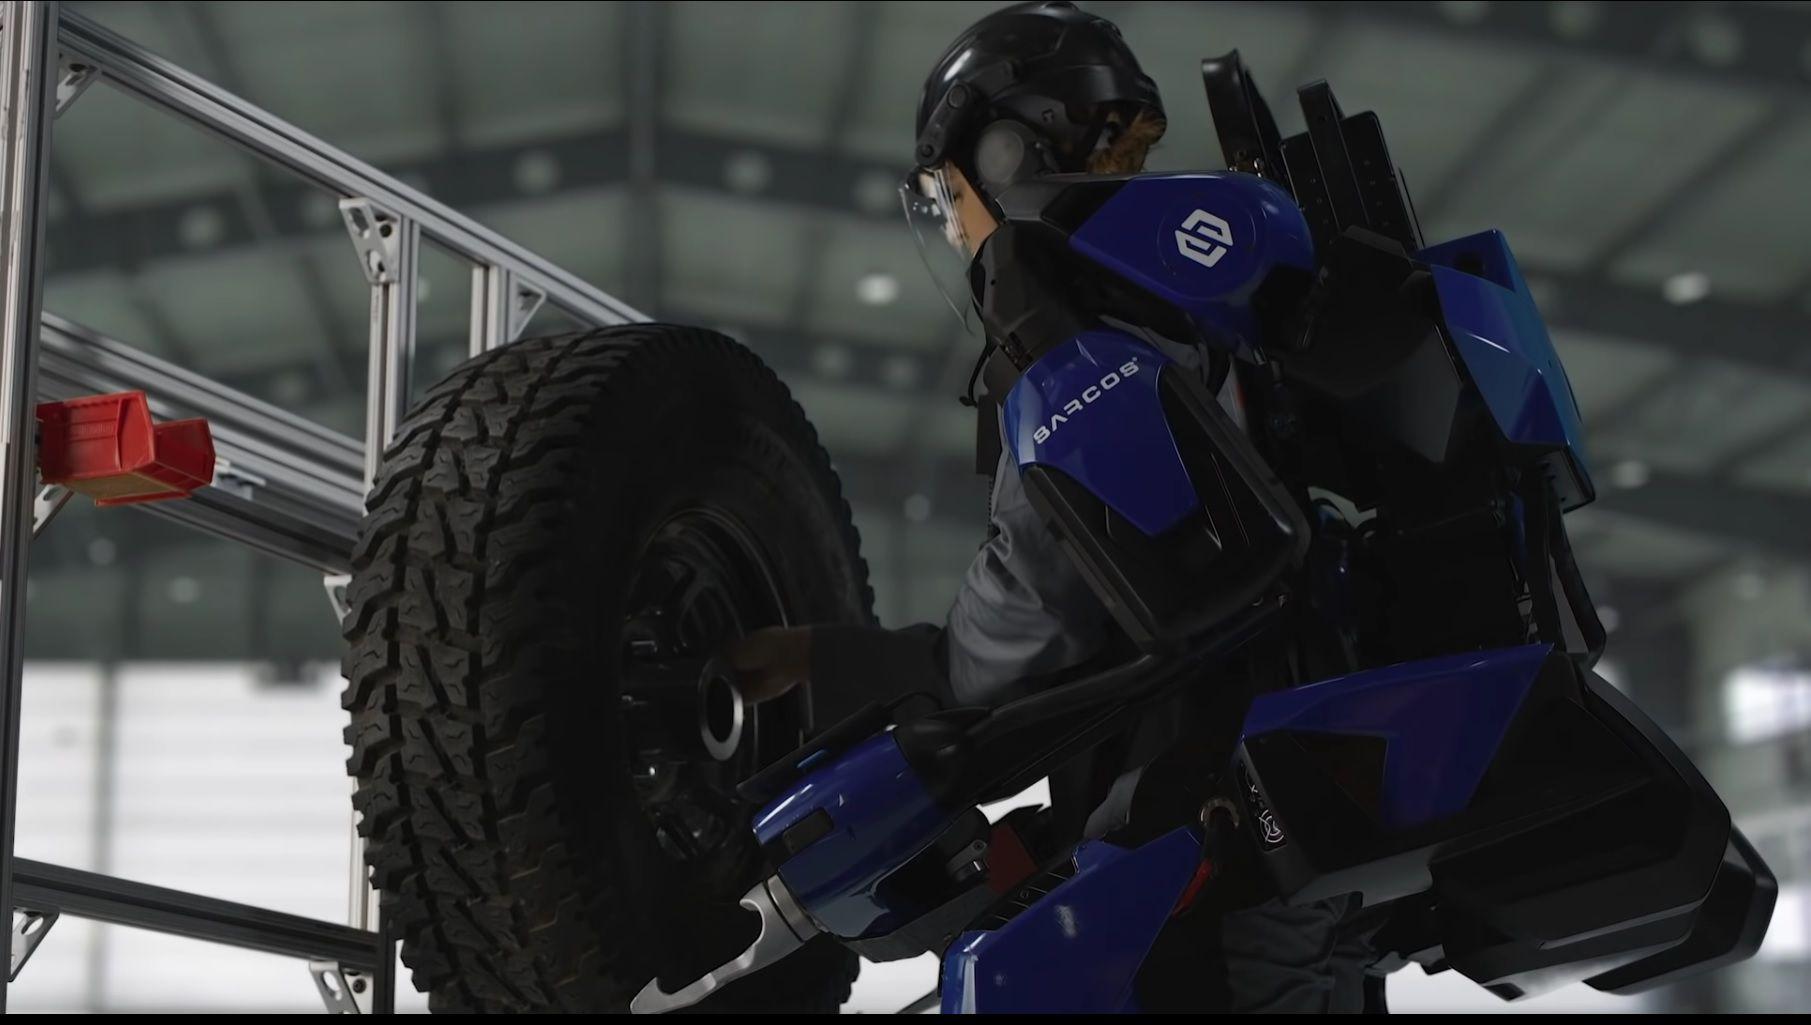 Exoesqueleto de Sarcos para alivianar las tareas de carga